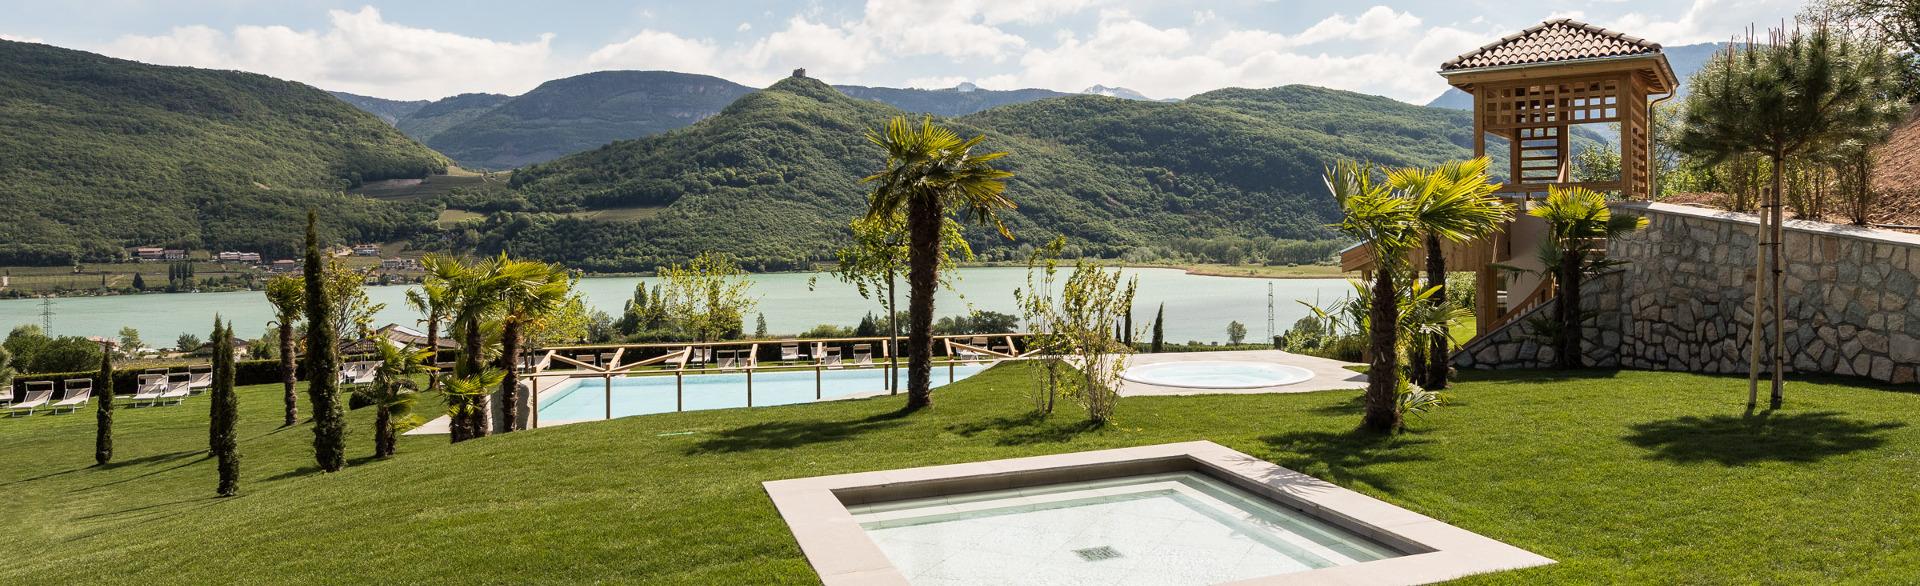 Ausblick-Badelandschaft